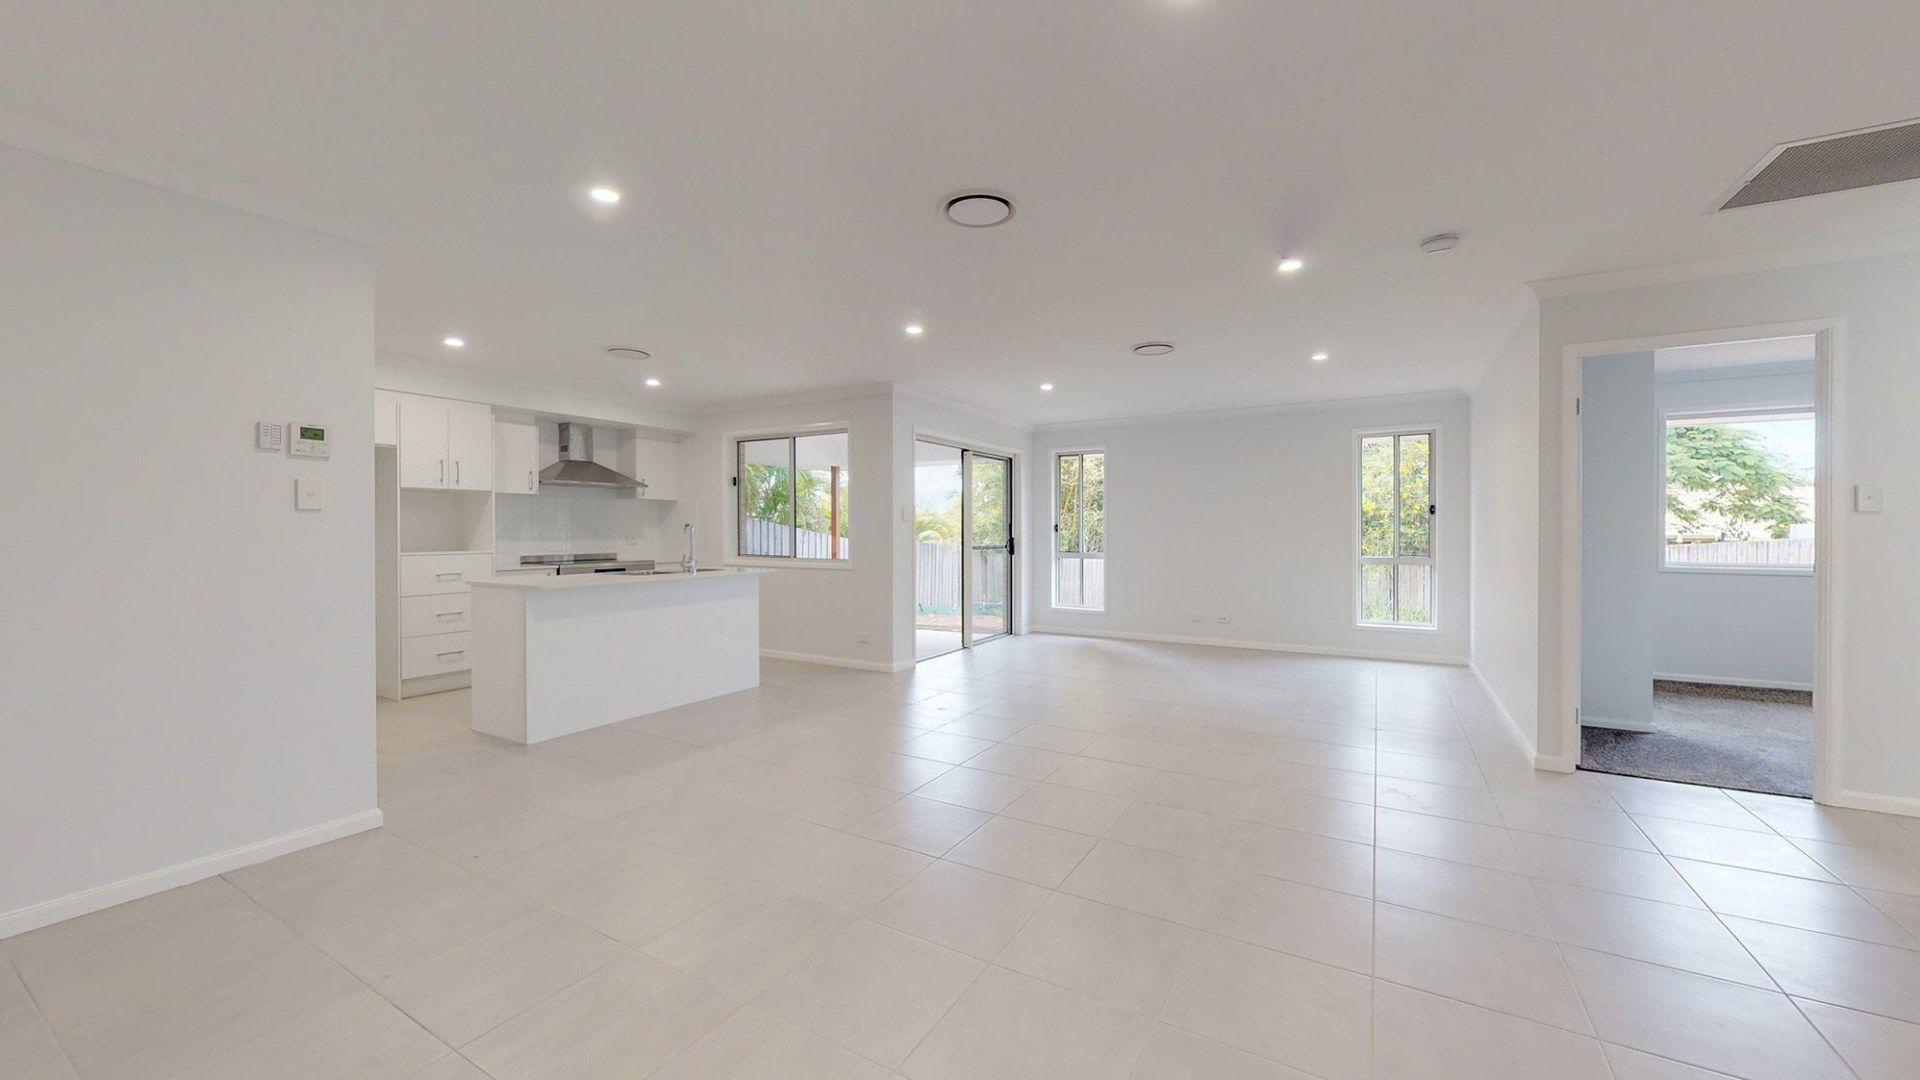 Lot 19 Cambooya Ridge Estate, Cambooya QLD 4358, Image 1